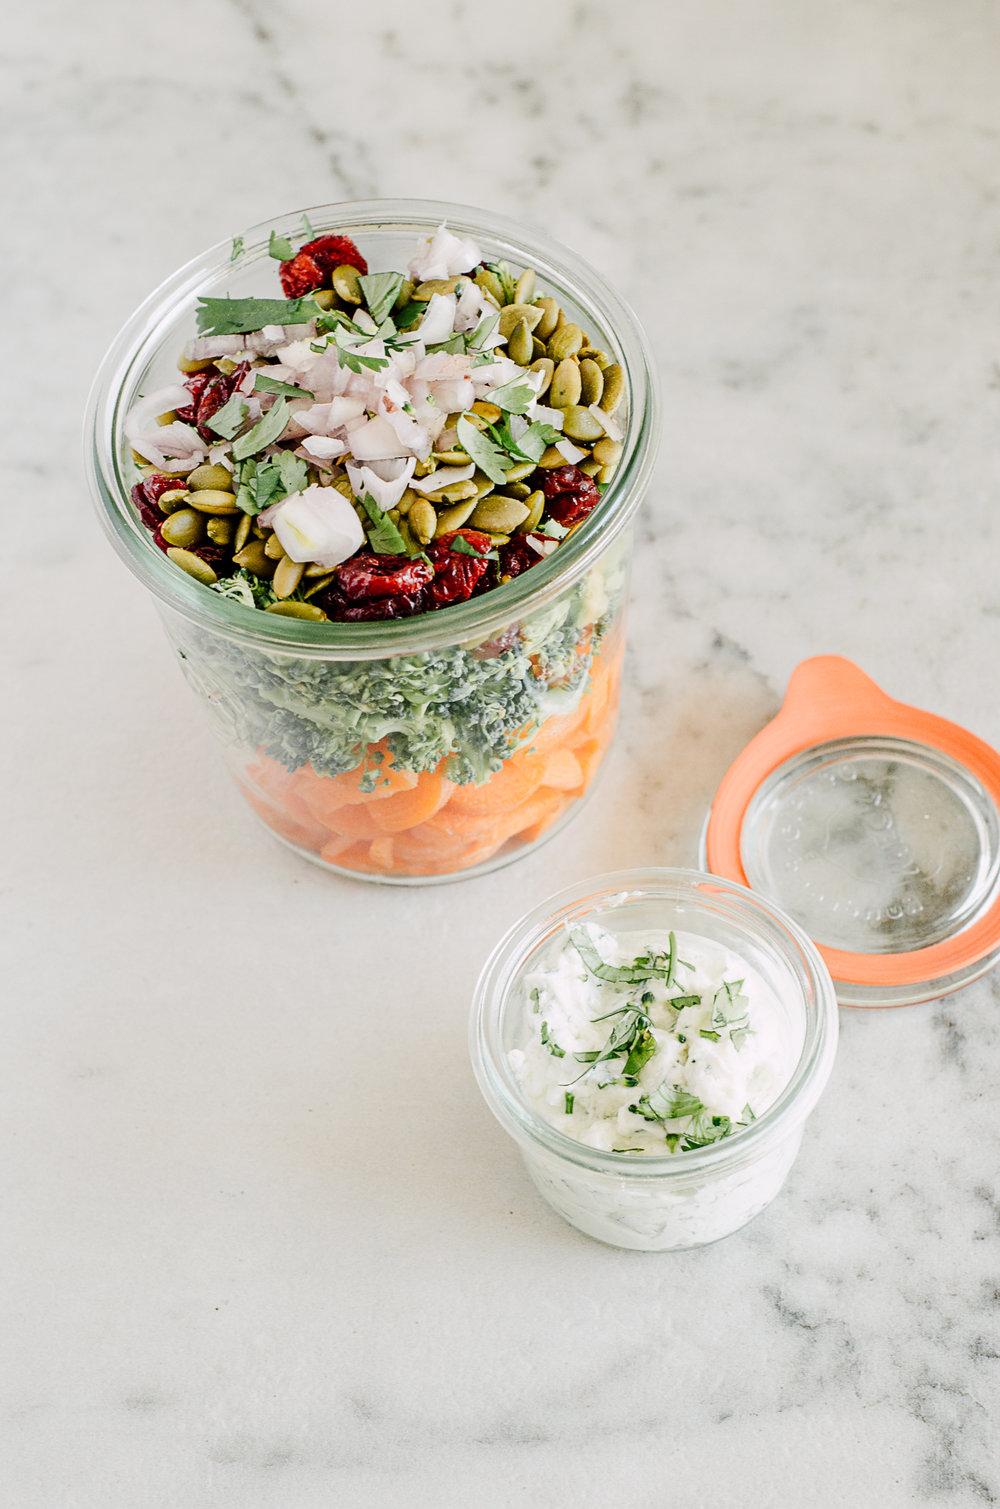 easy carrot & broccoli salad recipe with a creamy yogurt dressing - the nomadic wife